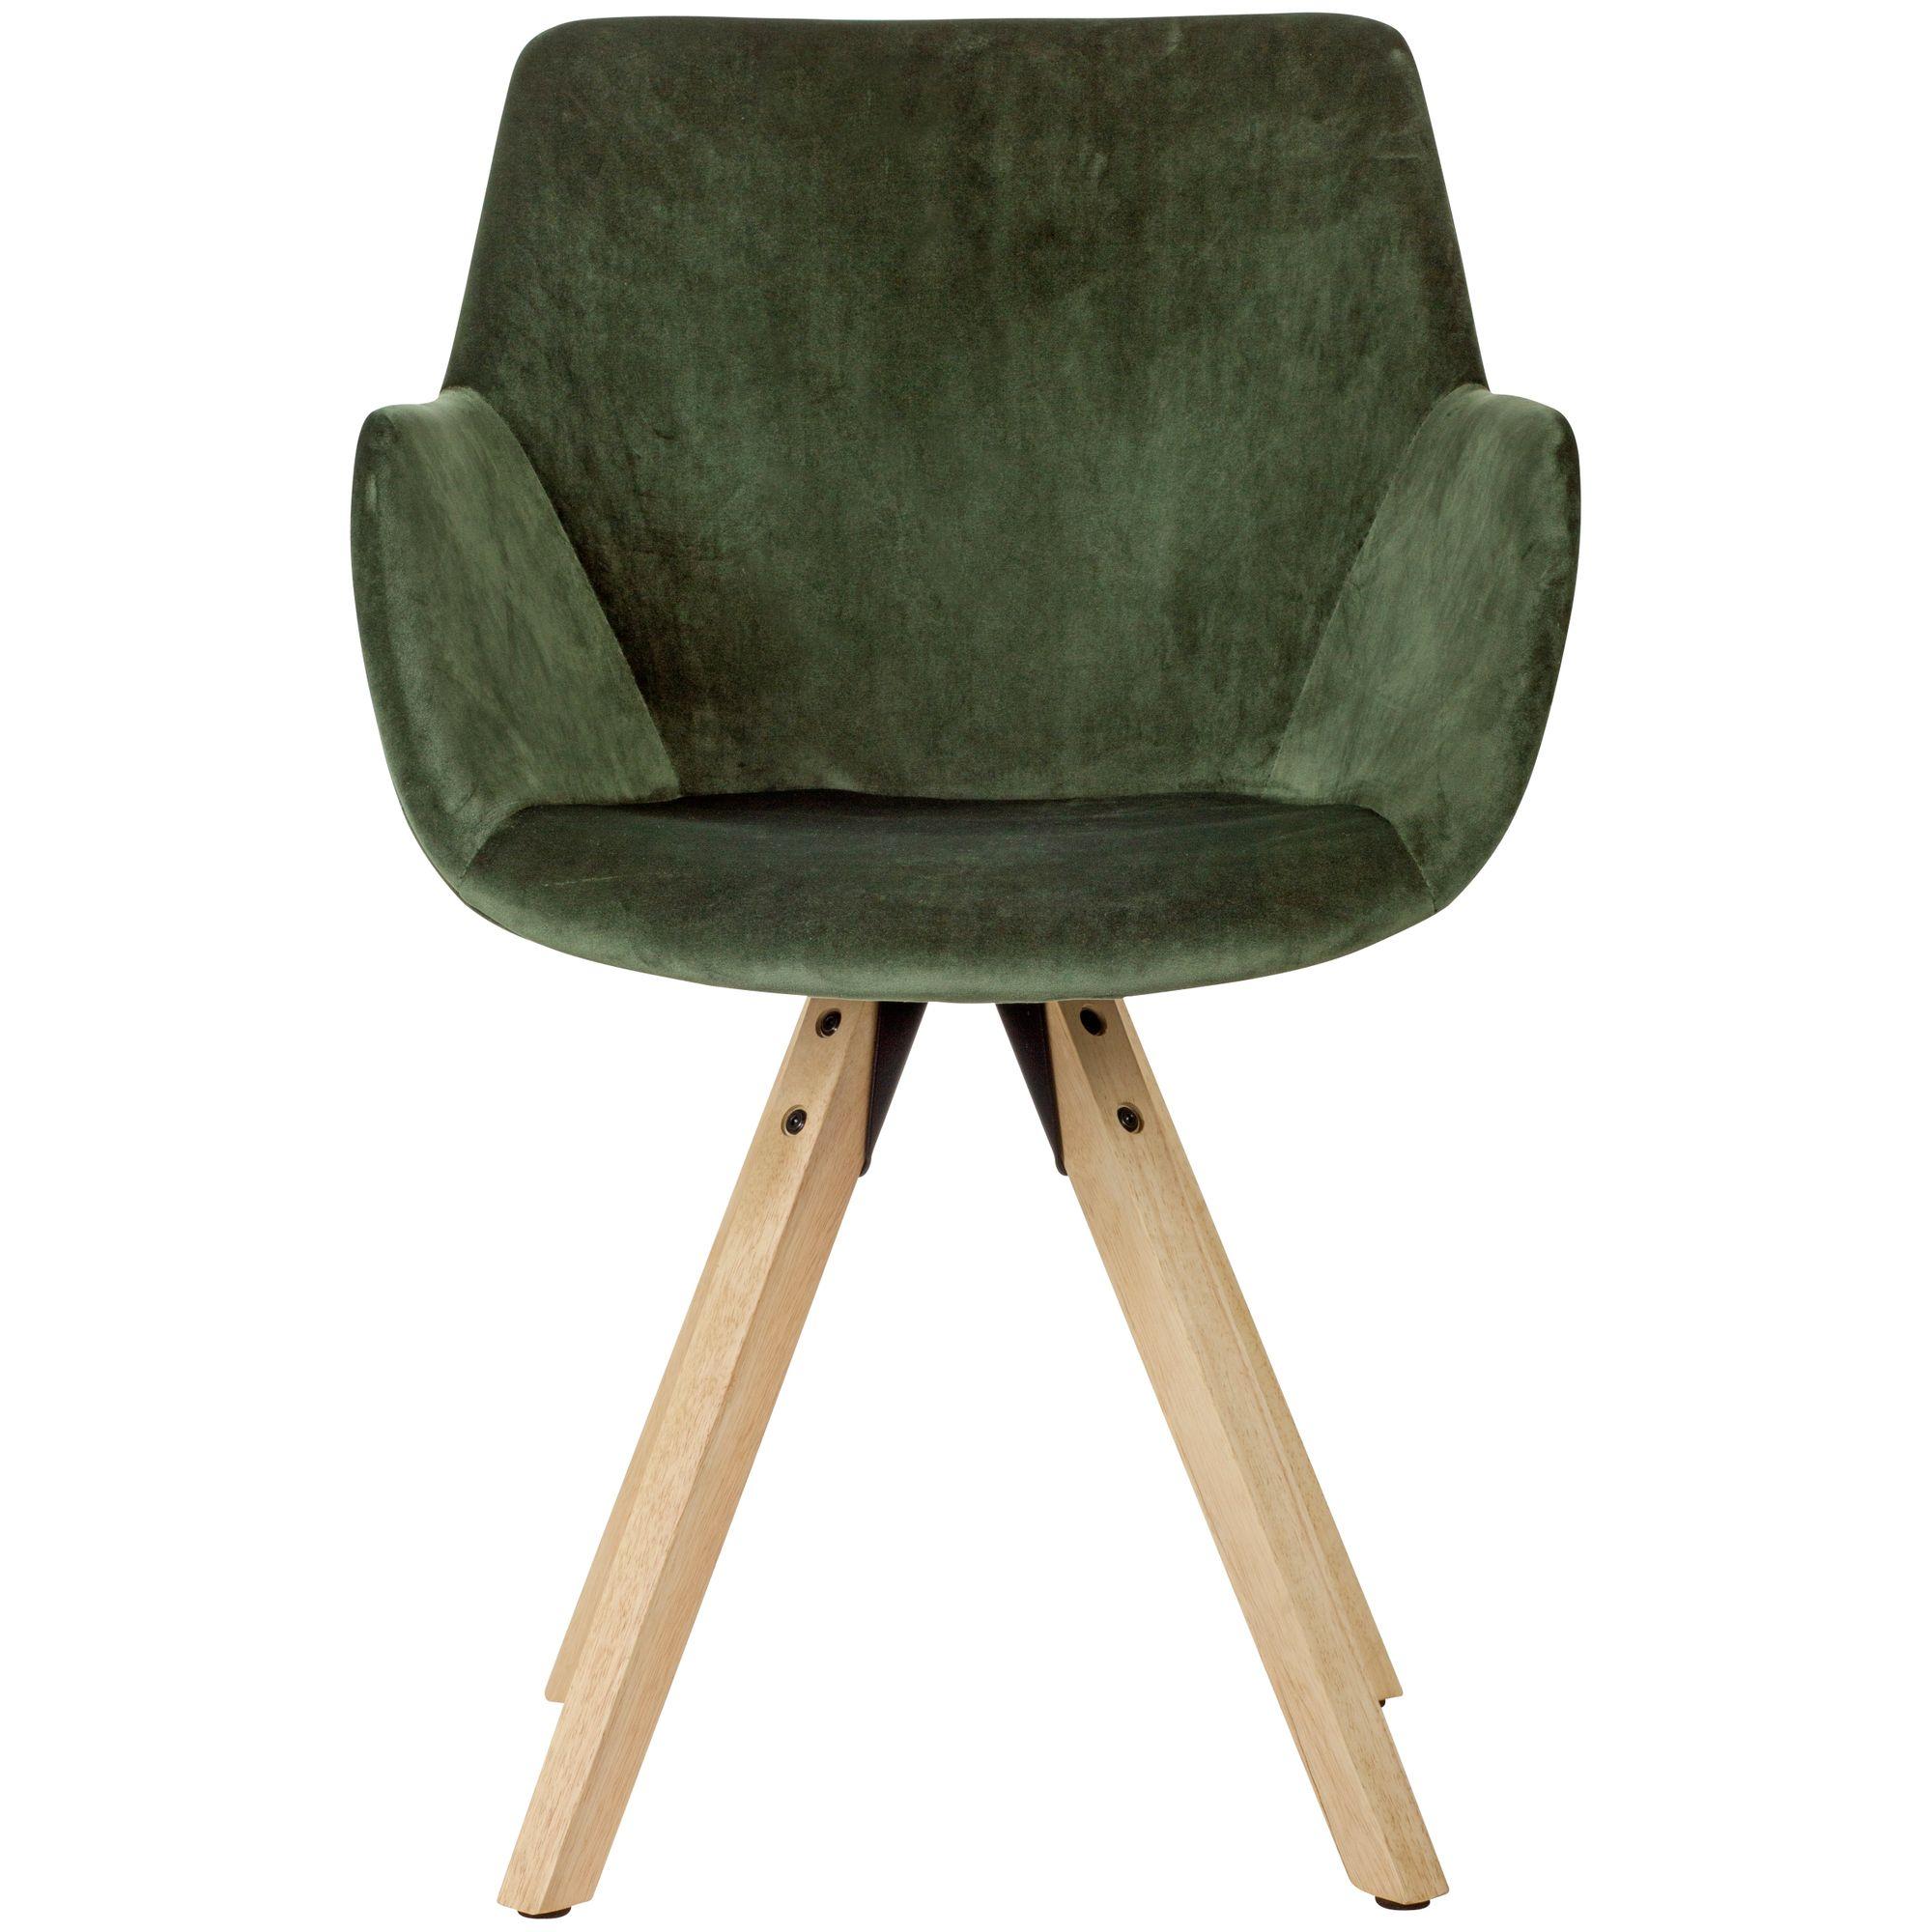 Wohnling Esszimmerstuhl 2er Set Grun Schalenstuhl Kuchenstuhl Samt Stuhl Modern